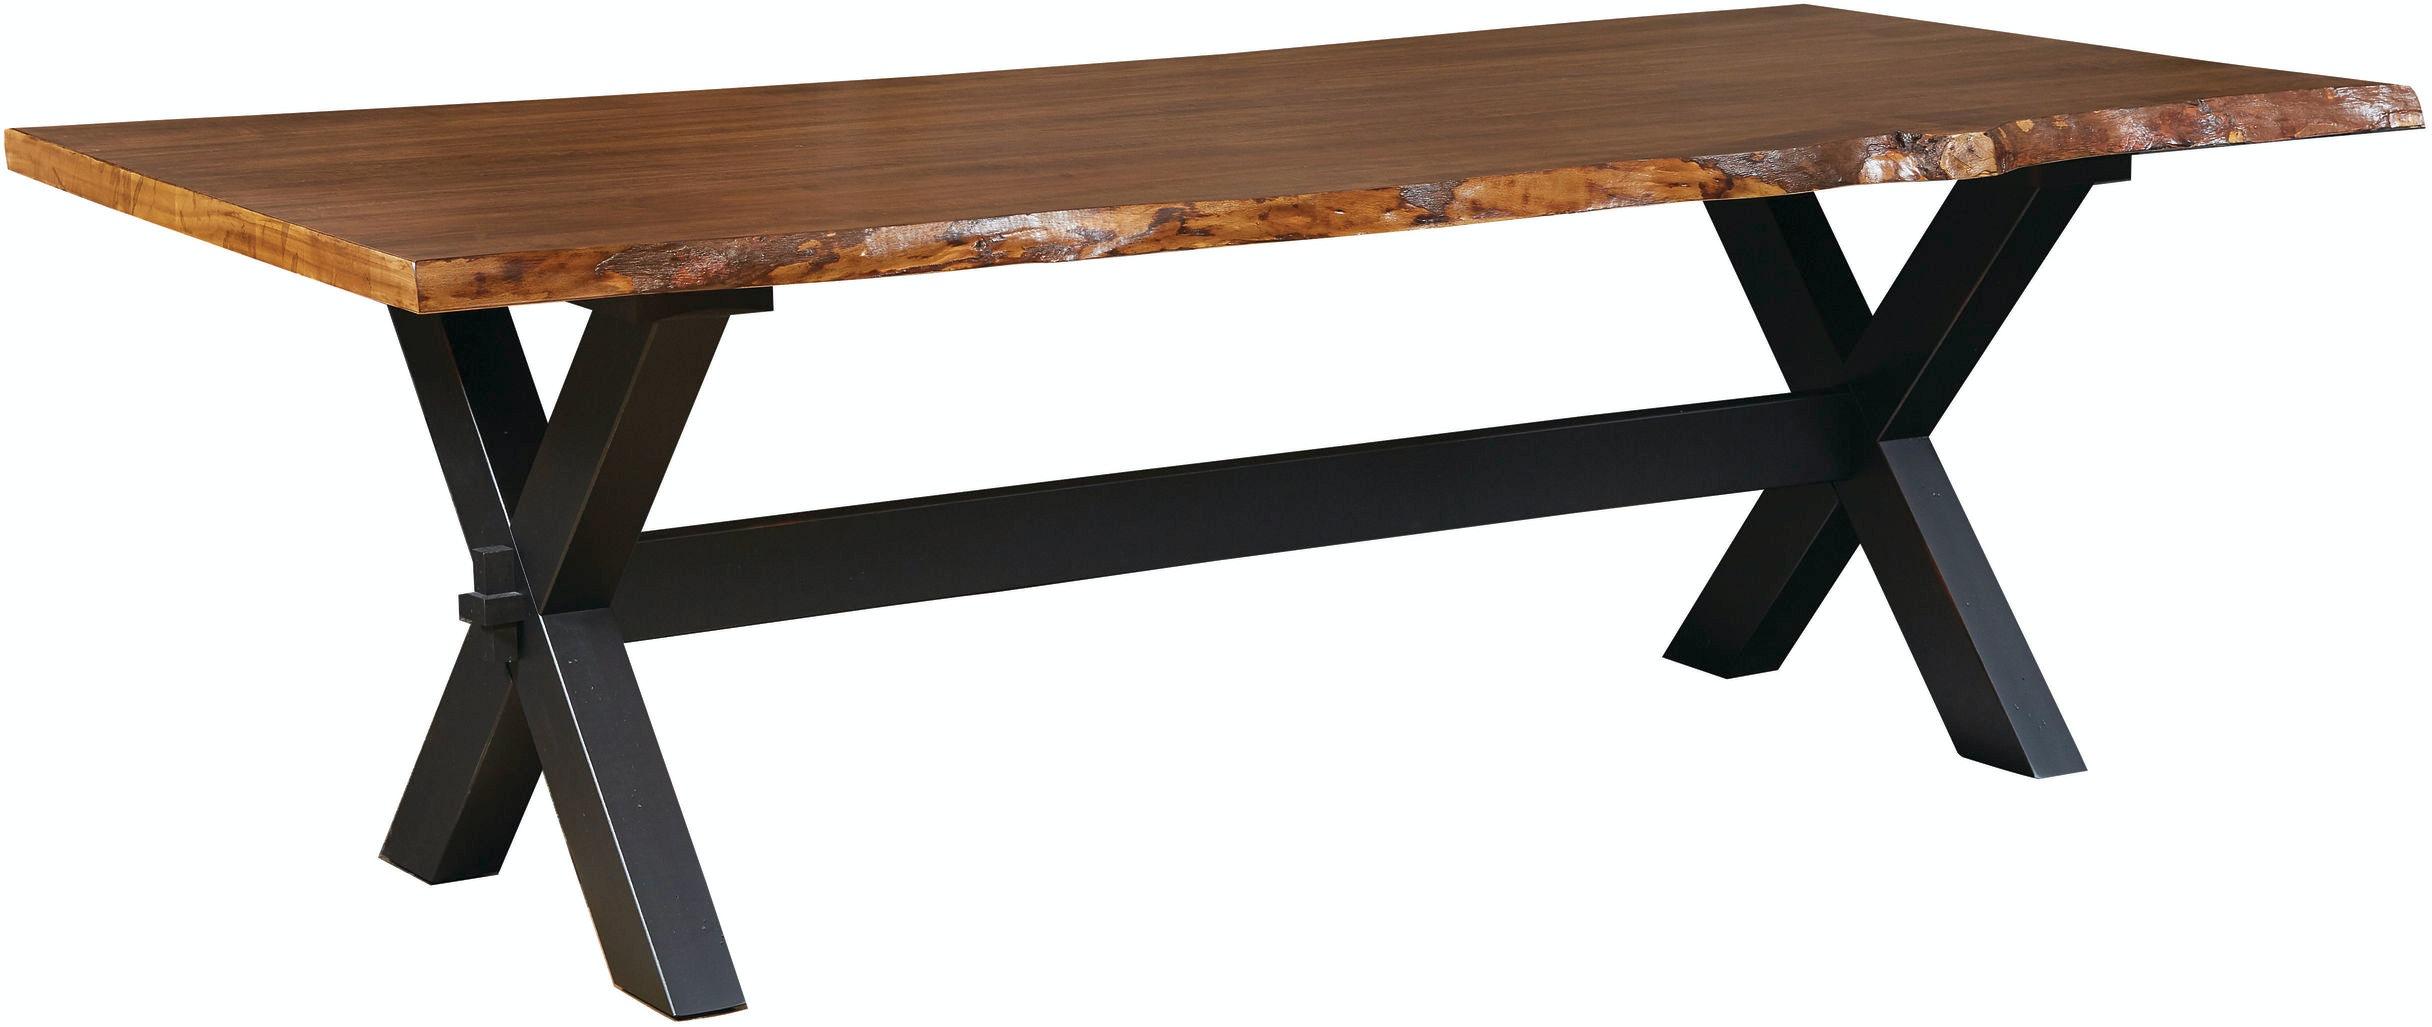 Log Furniture Grand Rapids Mi